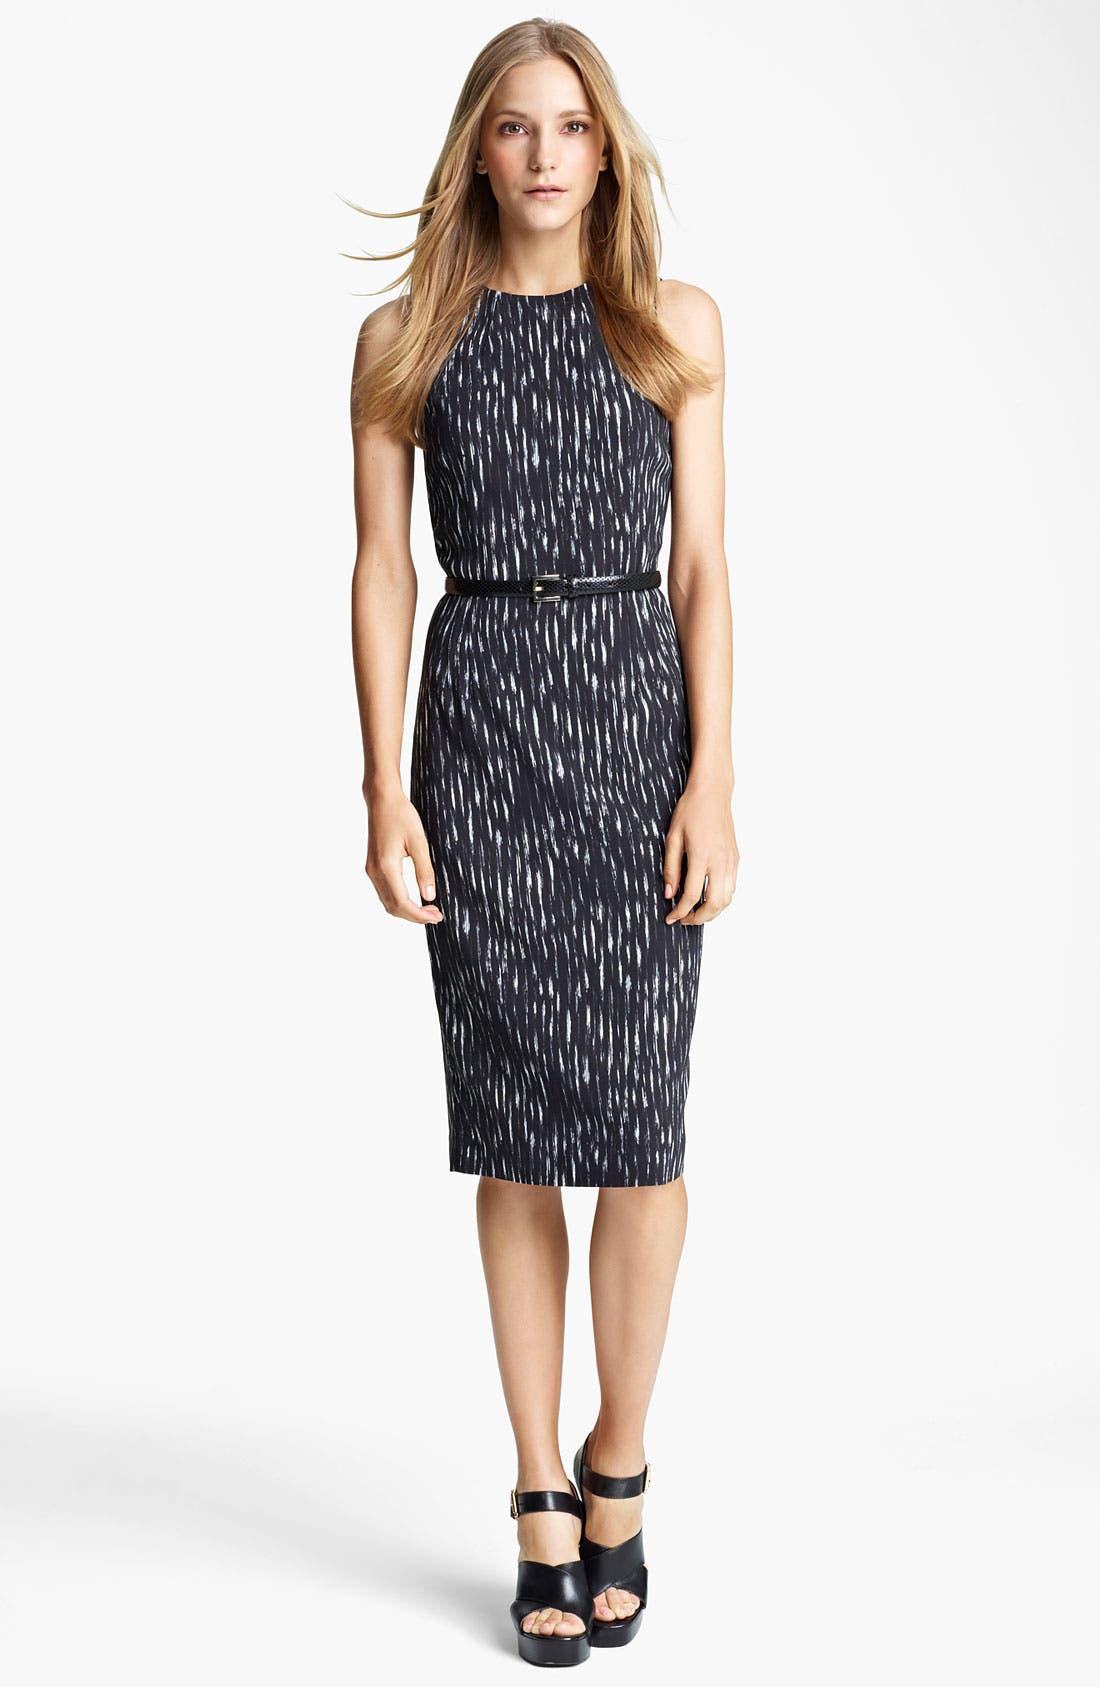 Alternate Image 1 Selected - Michael Kors Ikat Print Cady Sheath Dress